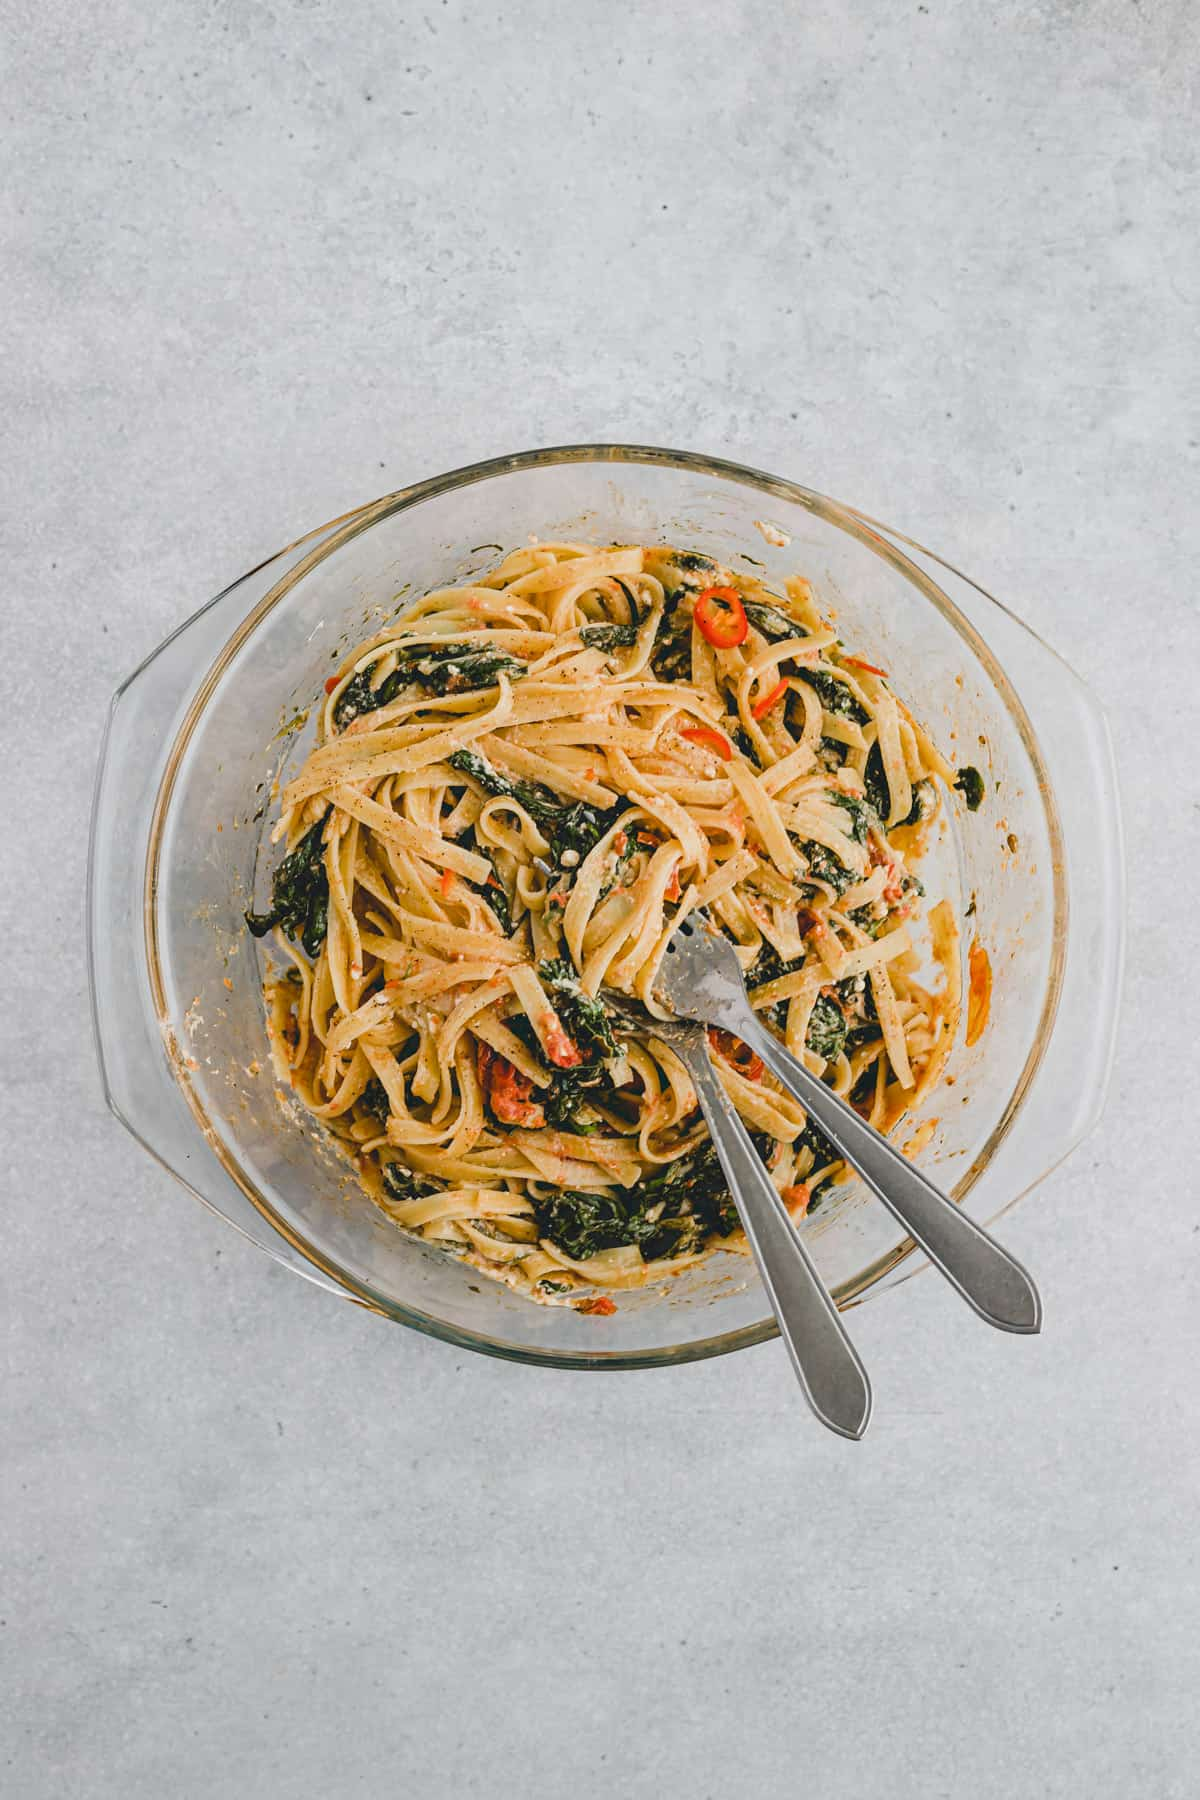 baked feta pasta recipe step 4